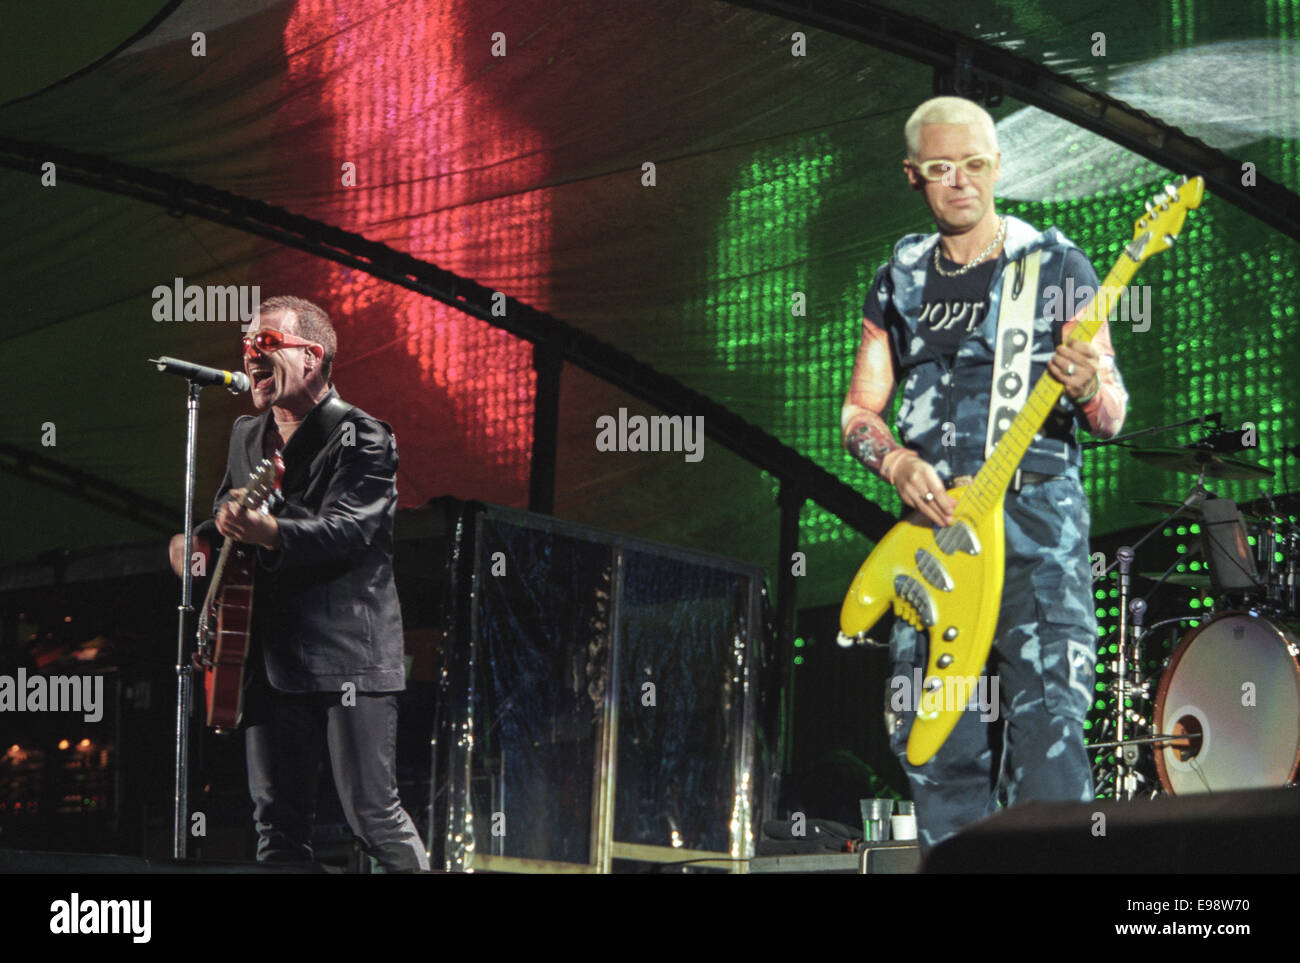 U2 in concert at Parkhead Stadium, in Glasgow, Scotland, in 1997. - Stock Image